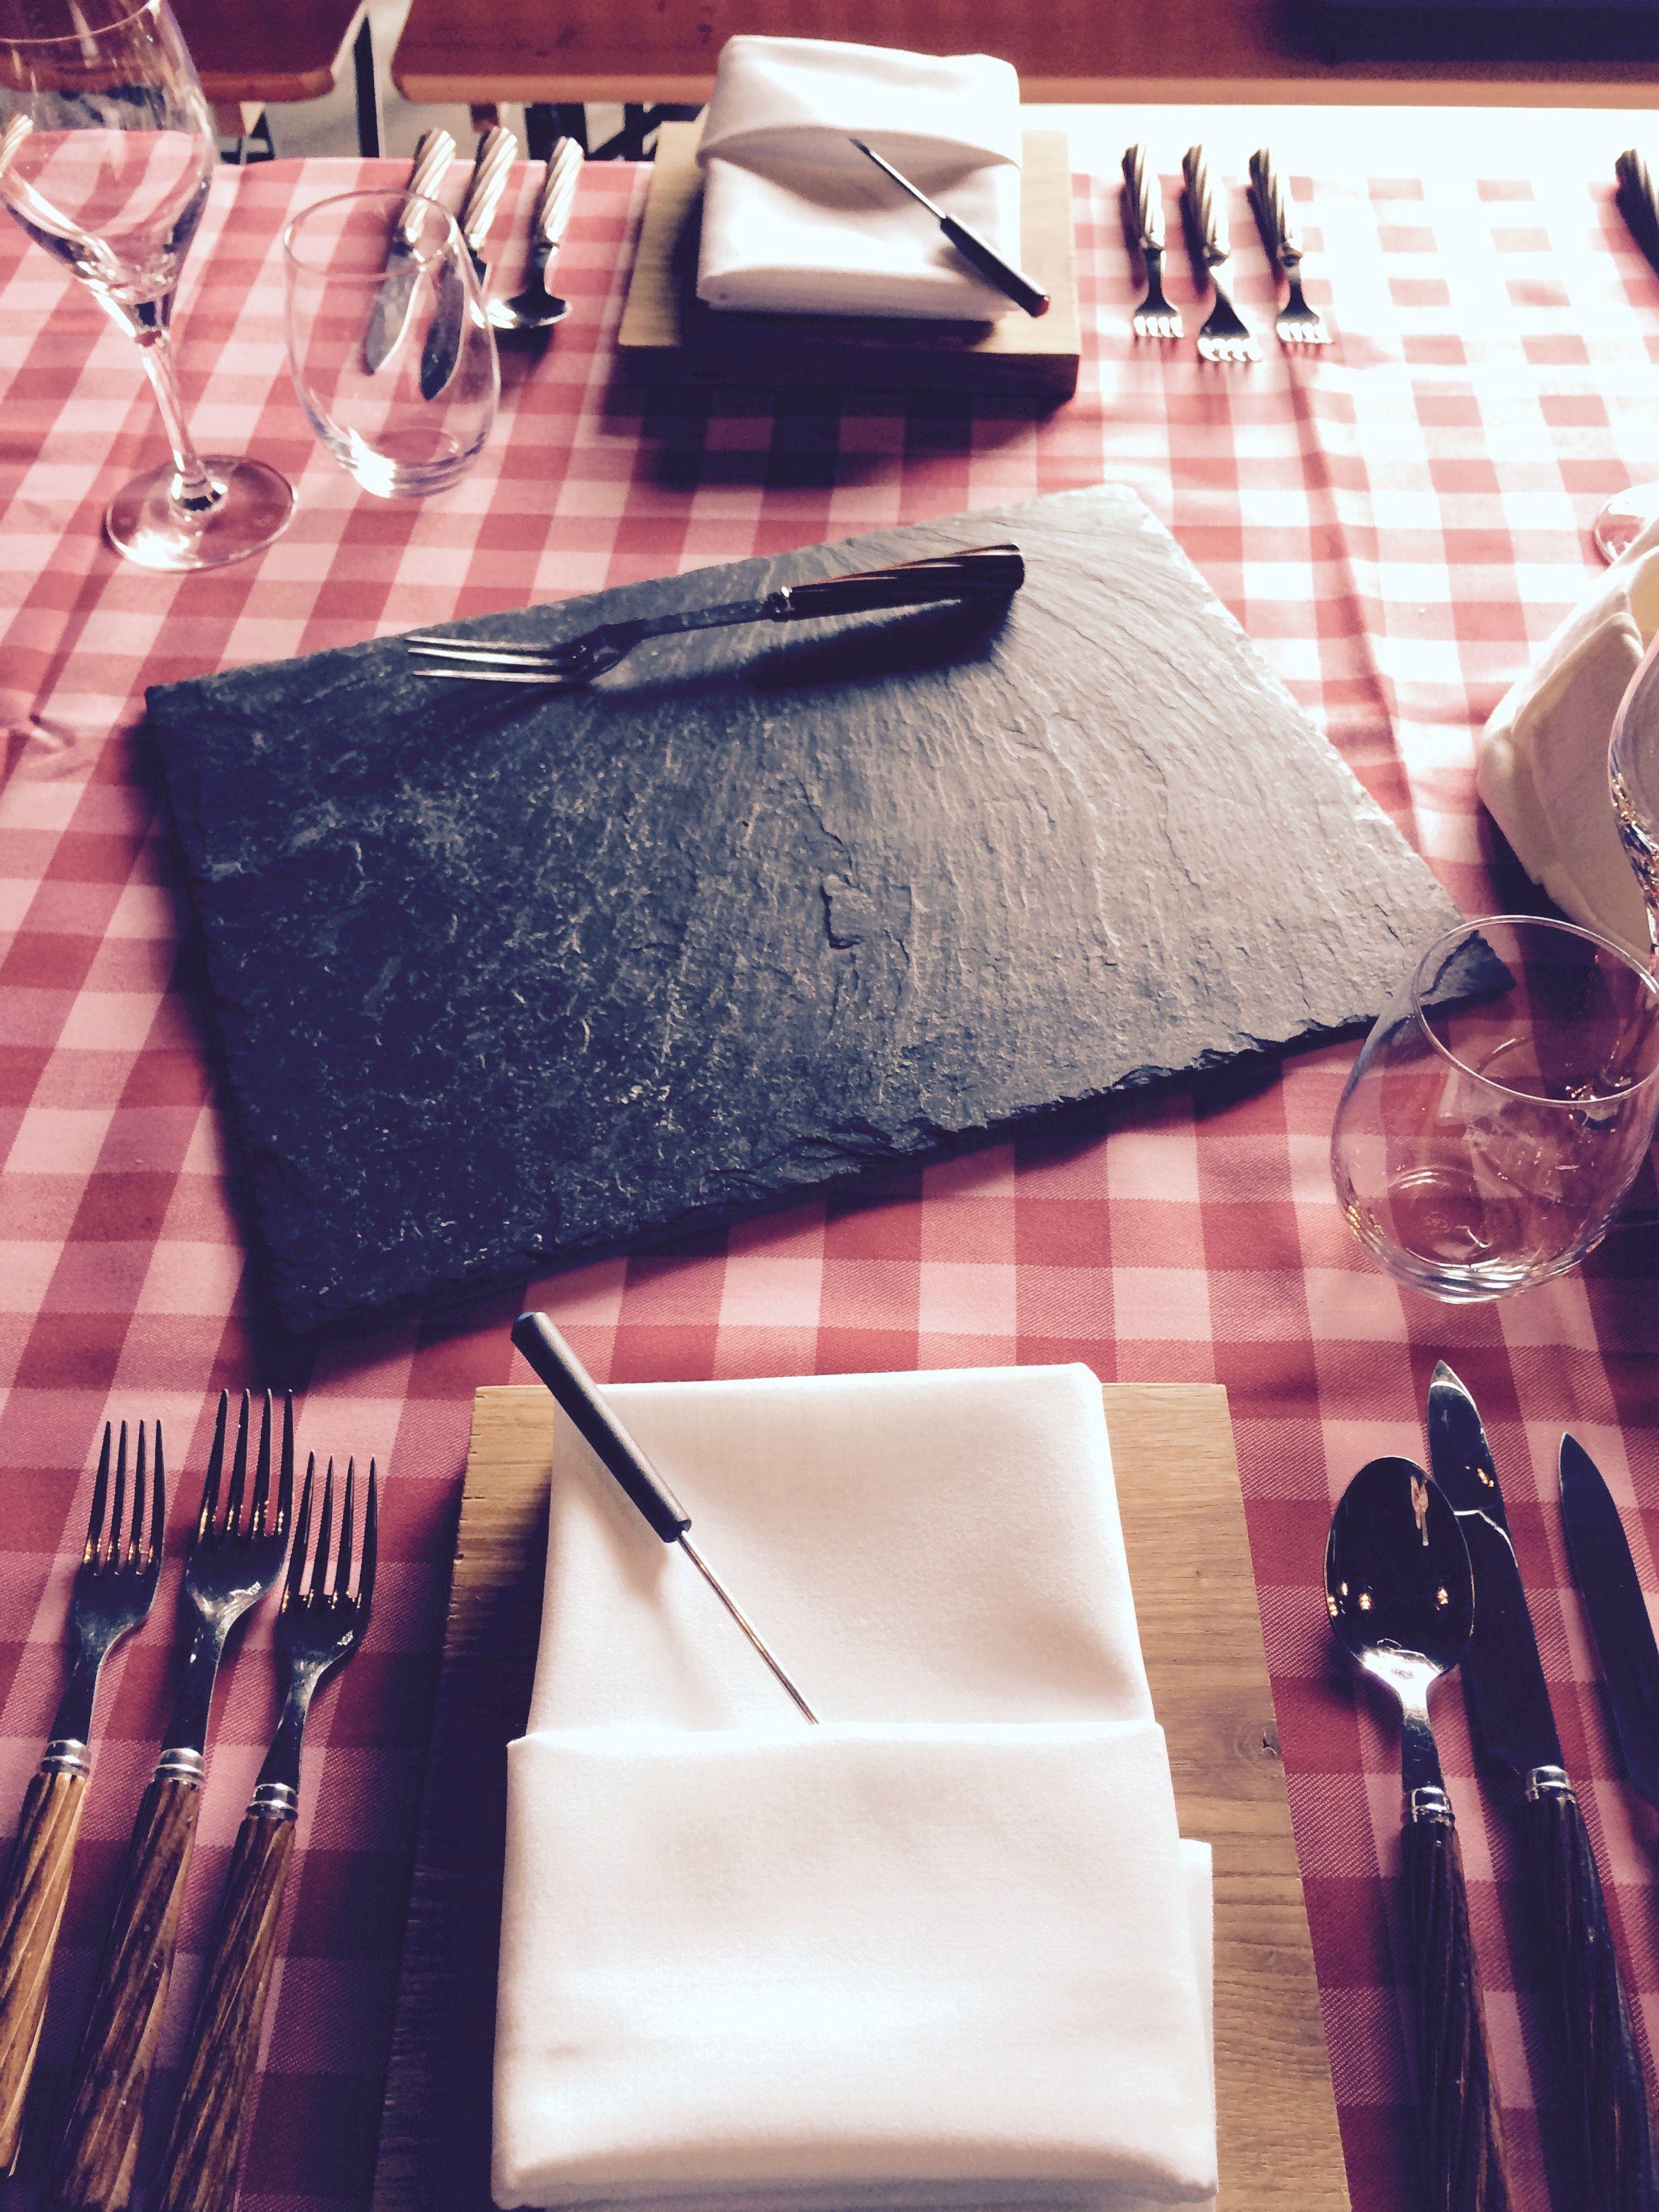 apres ski party table setting l 39 art de recevoir pinterest. Black Bedroom Furniture Sets. Home Design Ideas